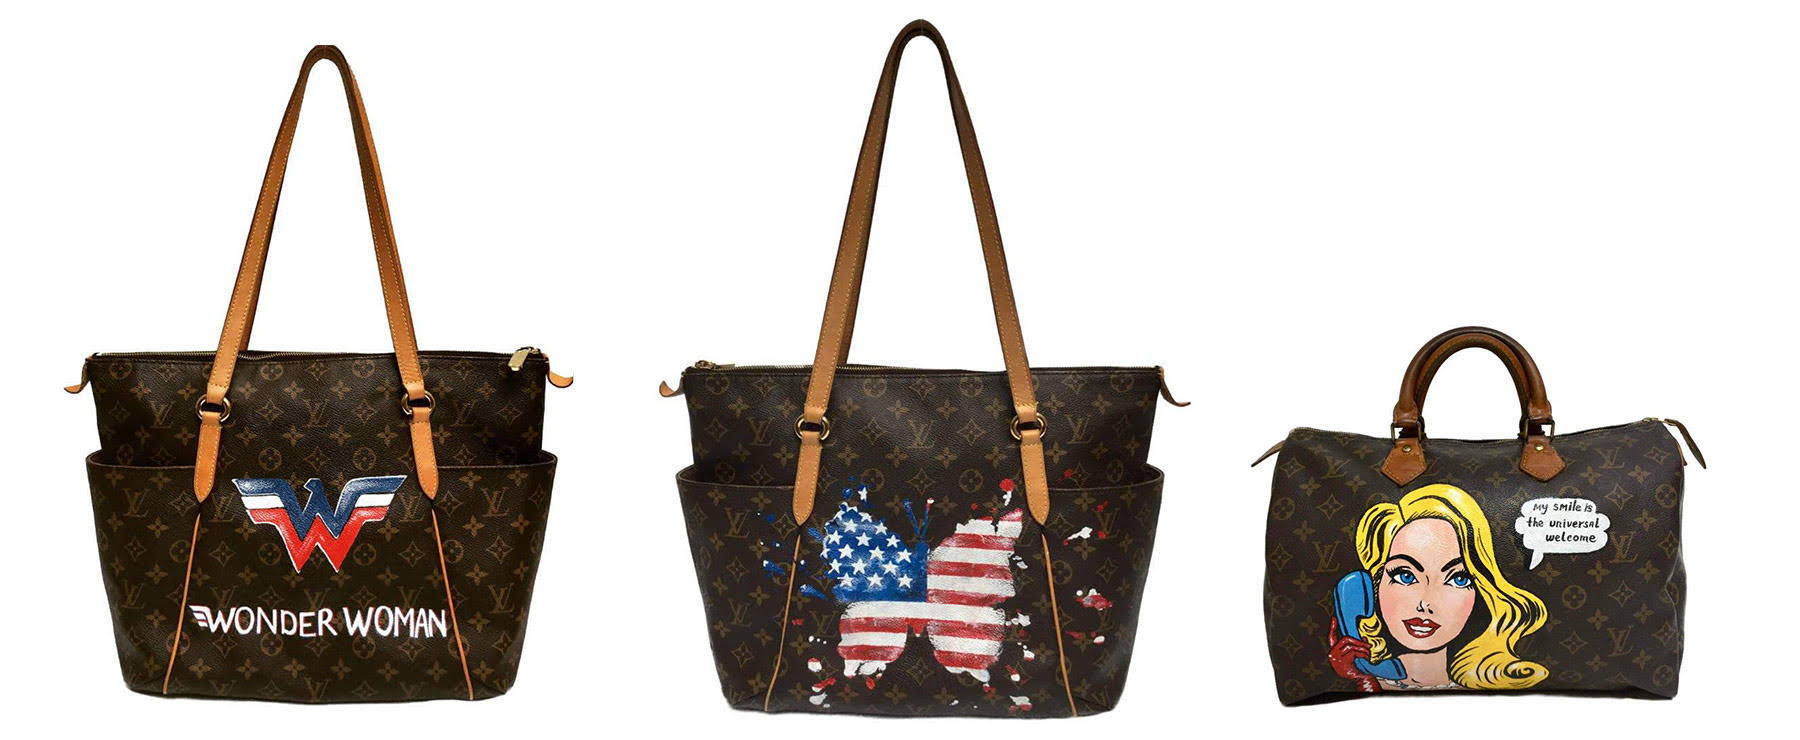 Custom painted Louis Vuitton bags